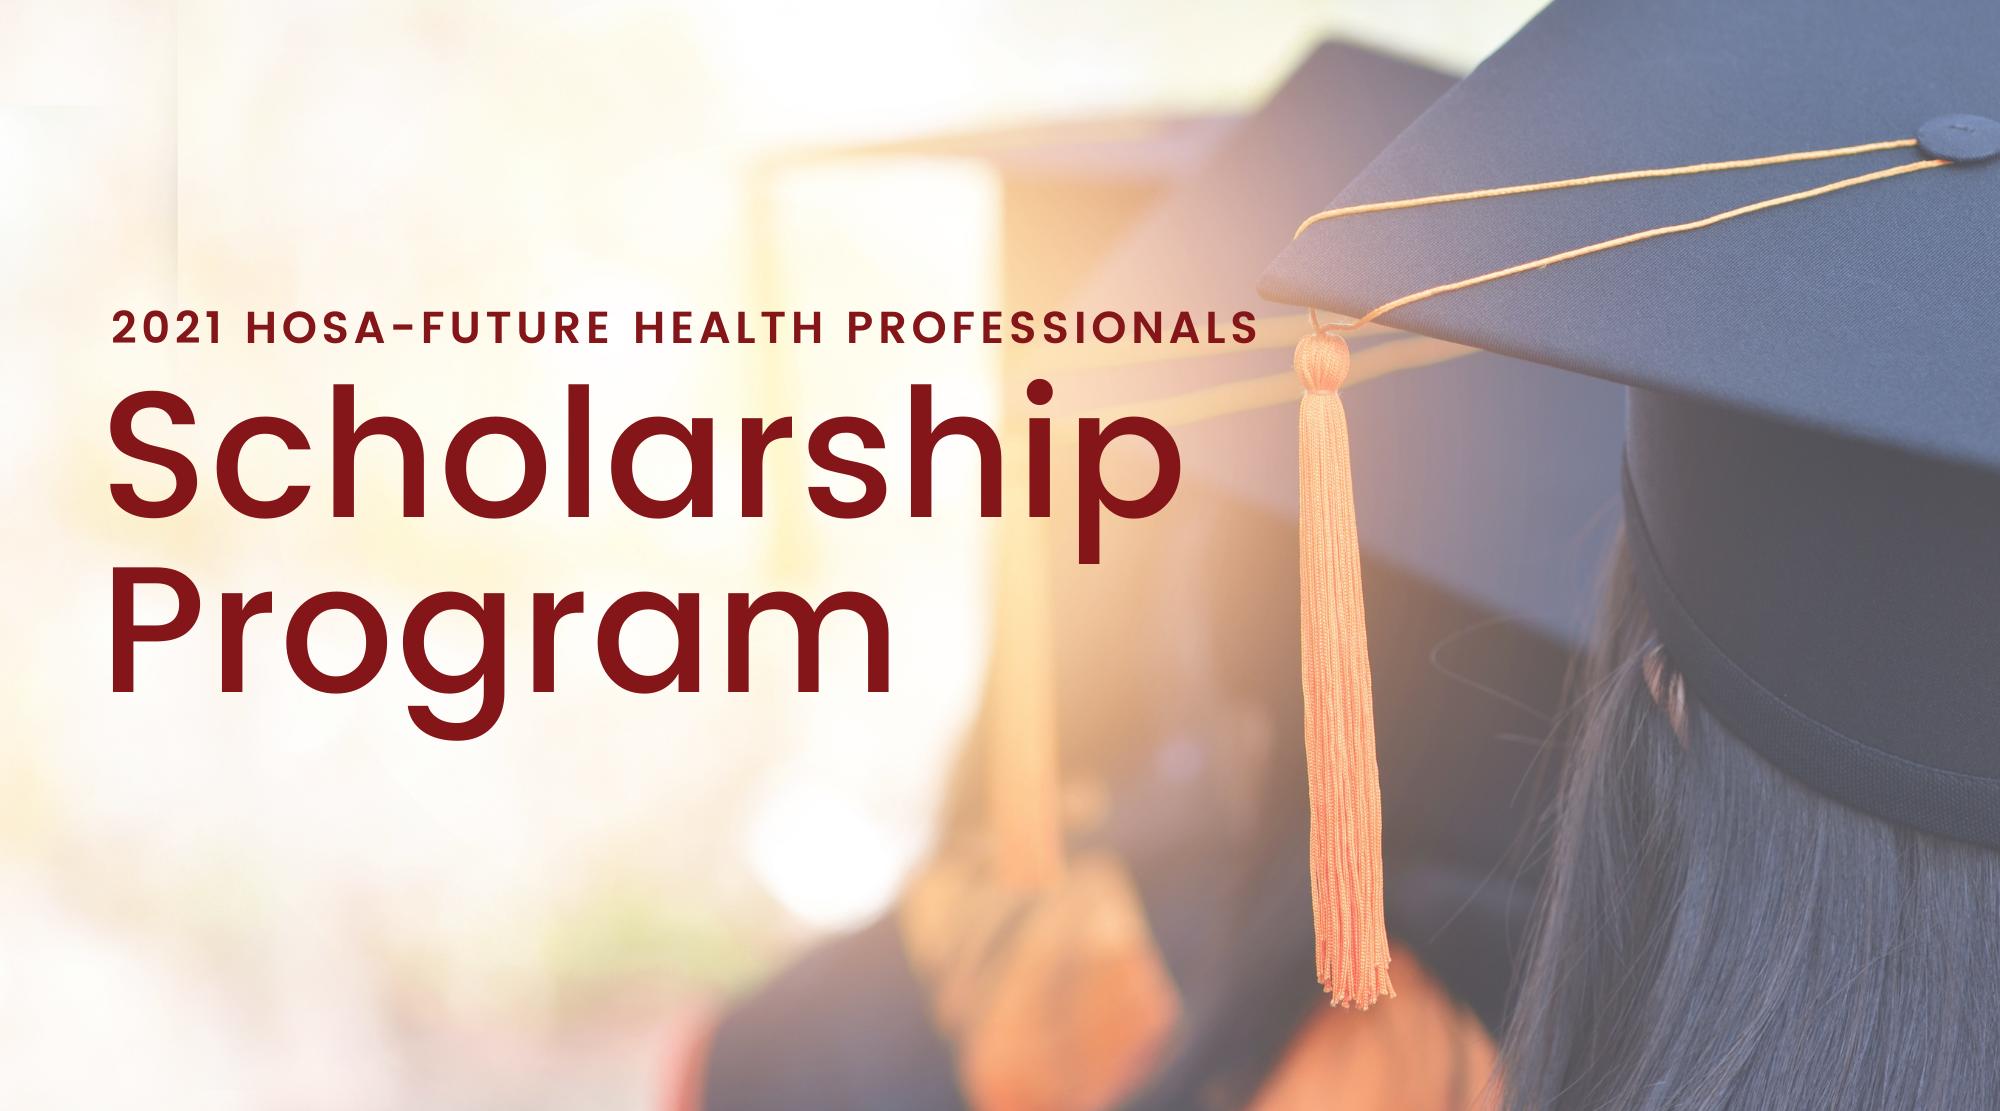 2021 HOSA Scholarship Program